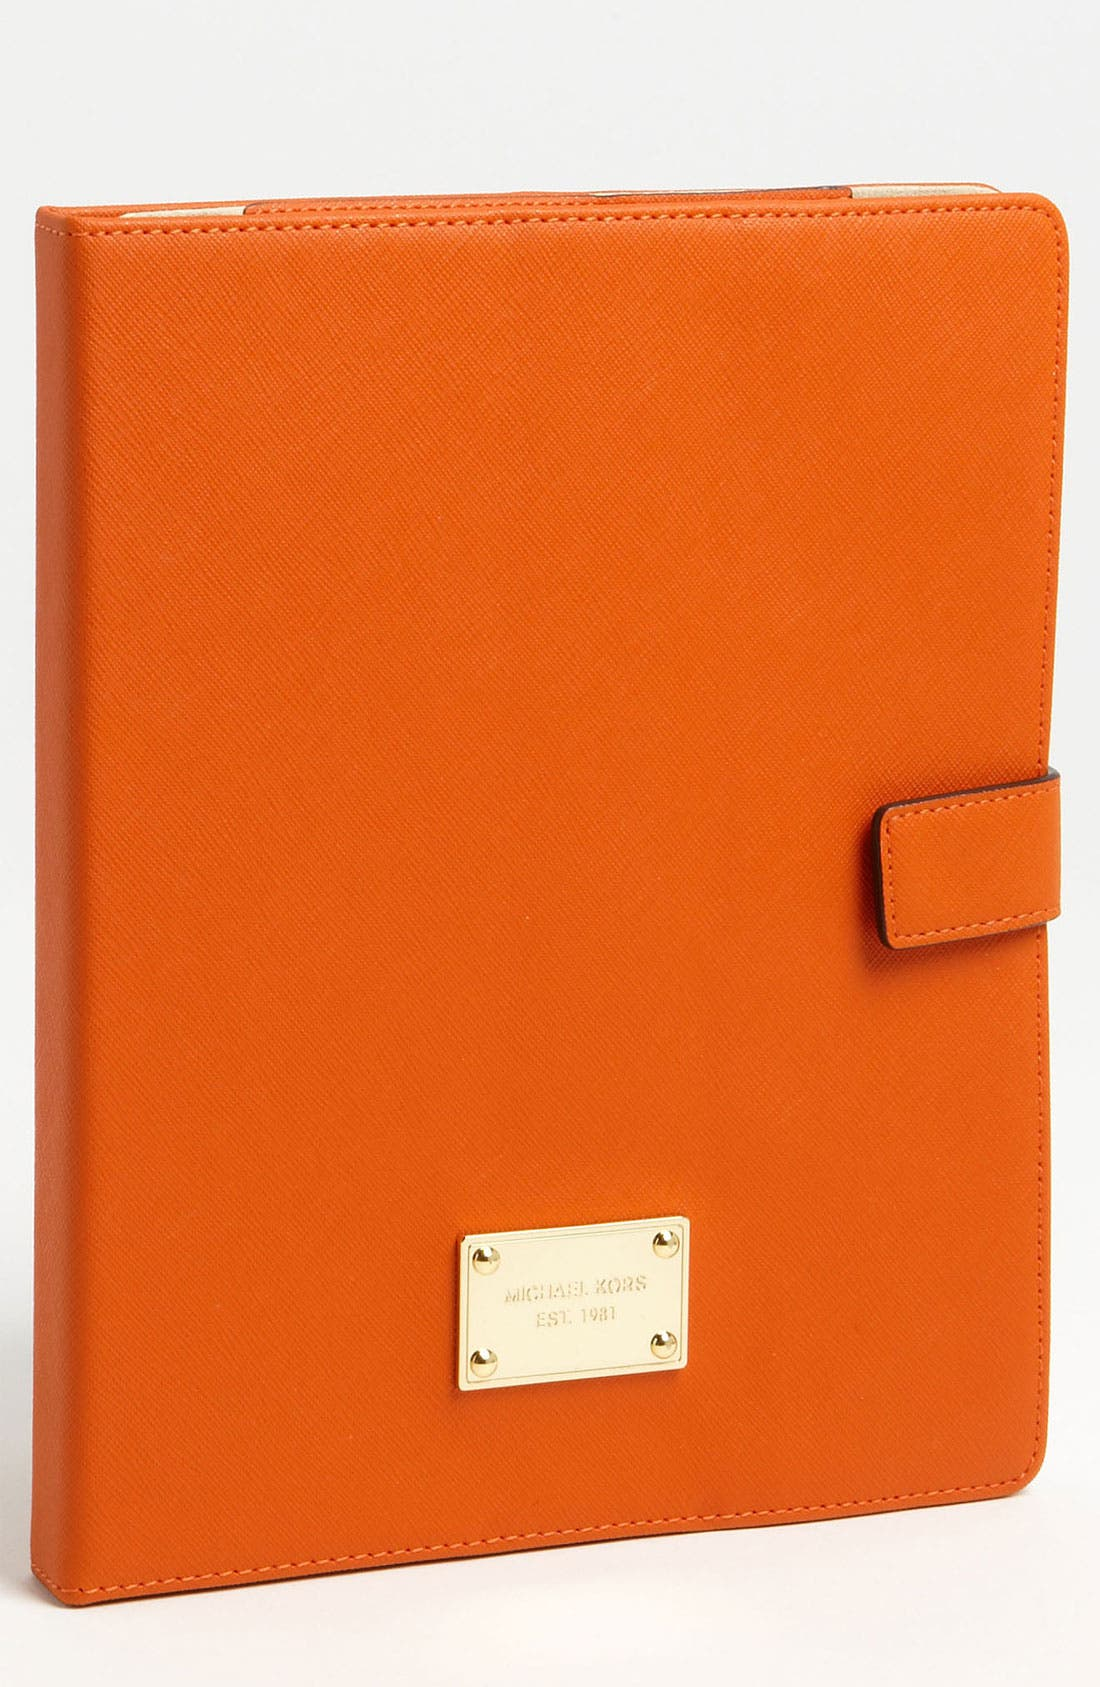 Main Image - MICHAEL Michael Kors Saffiano Leather iPad 2 & 3 Stand